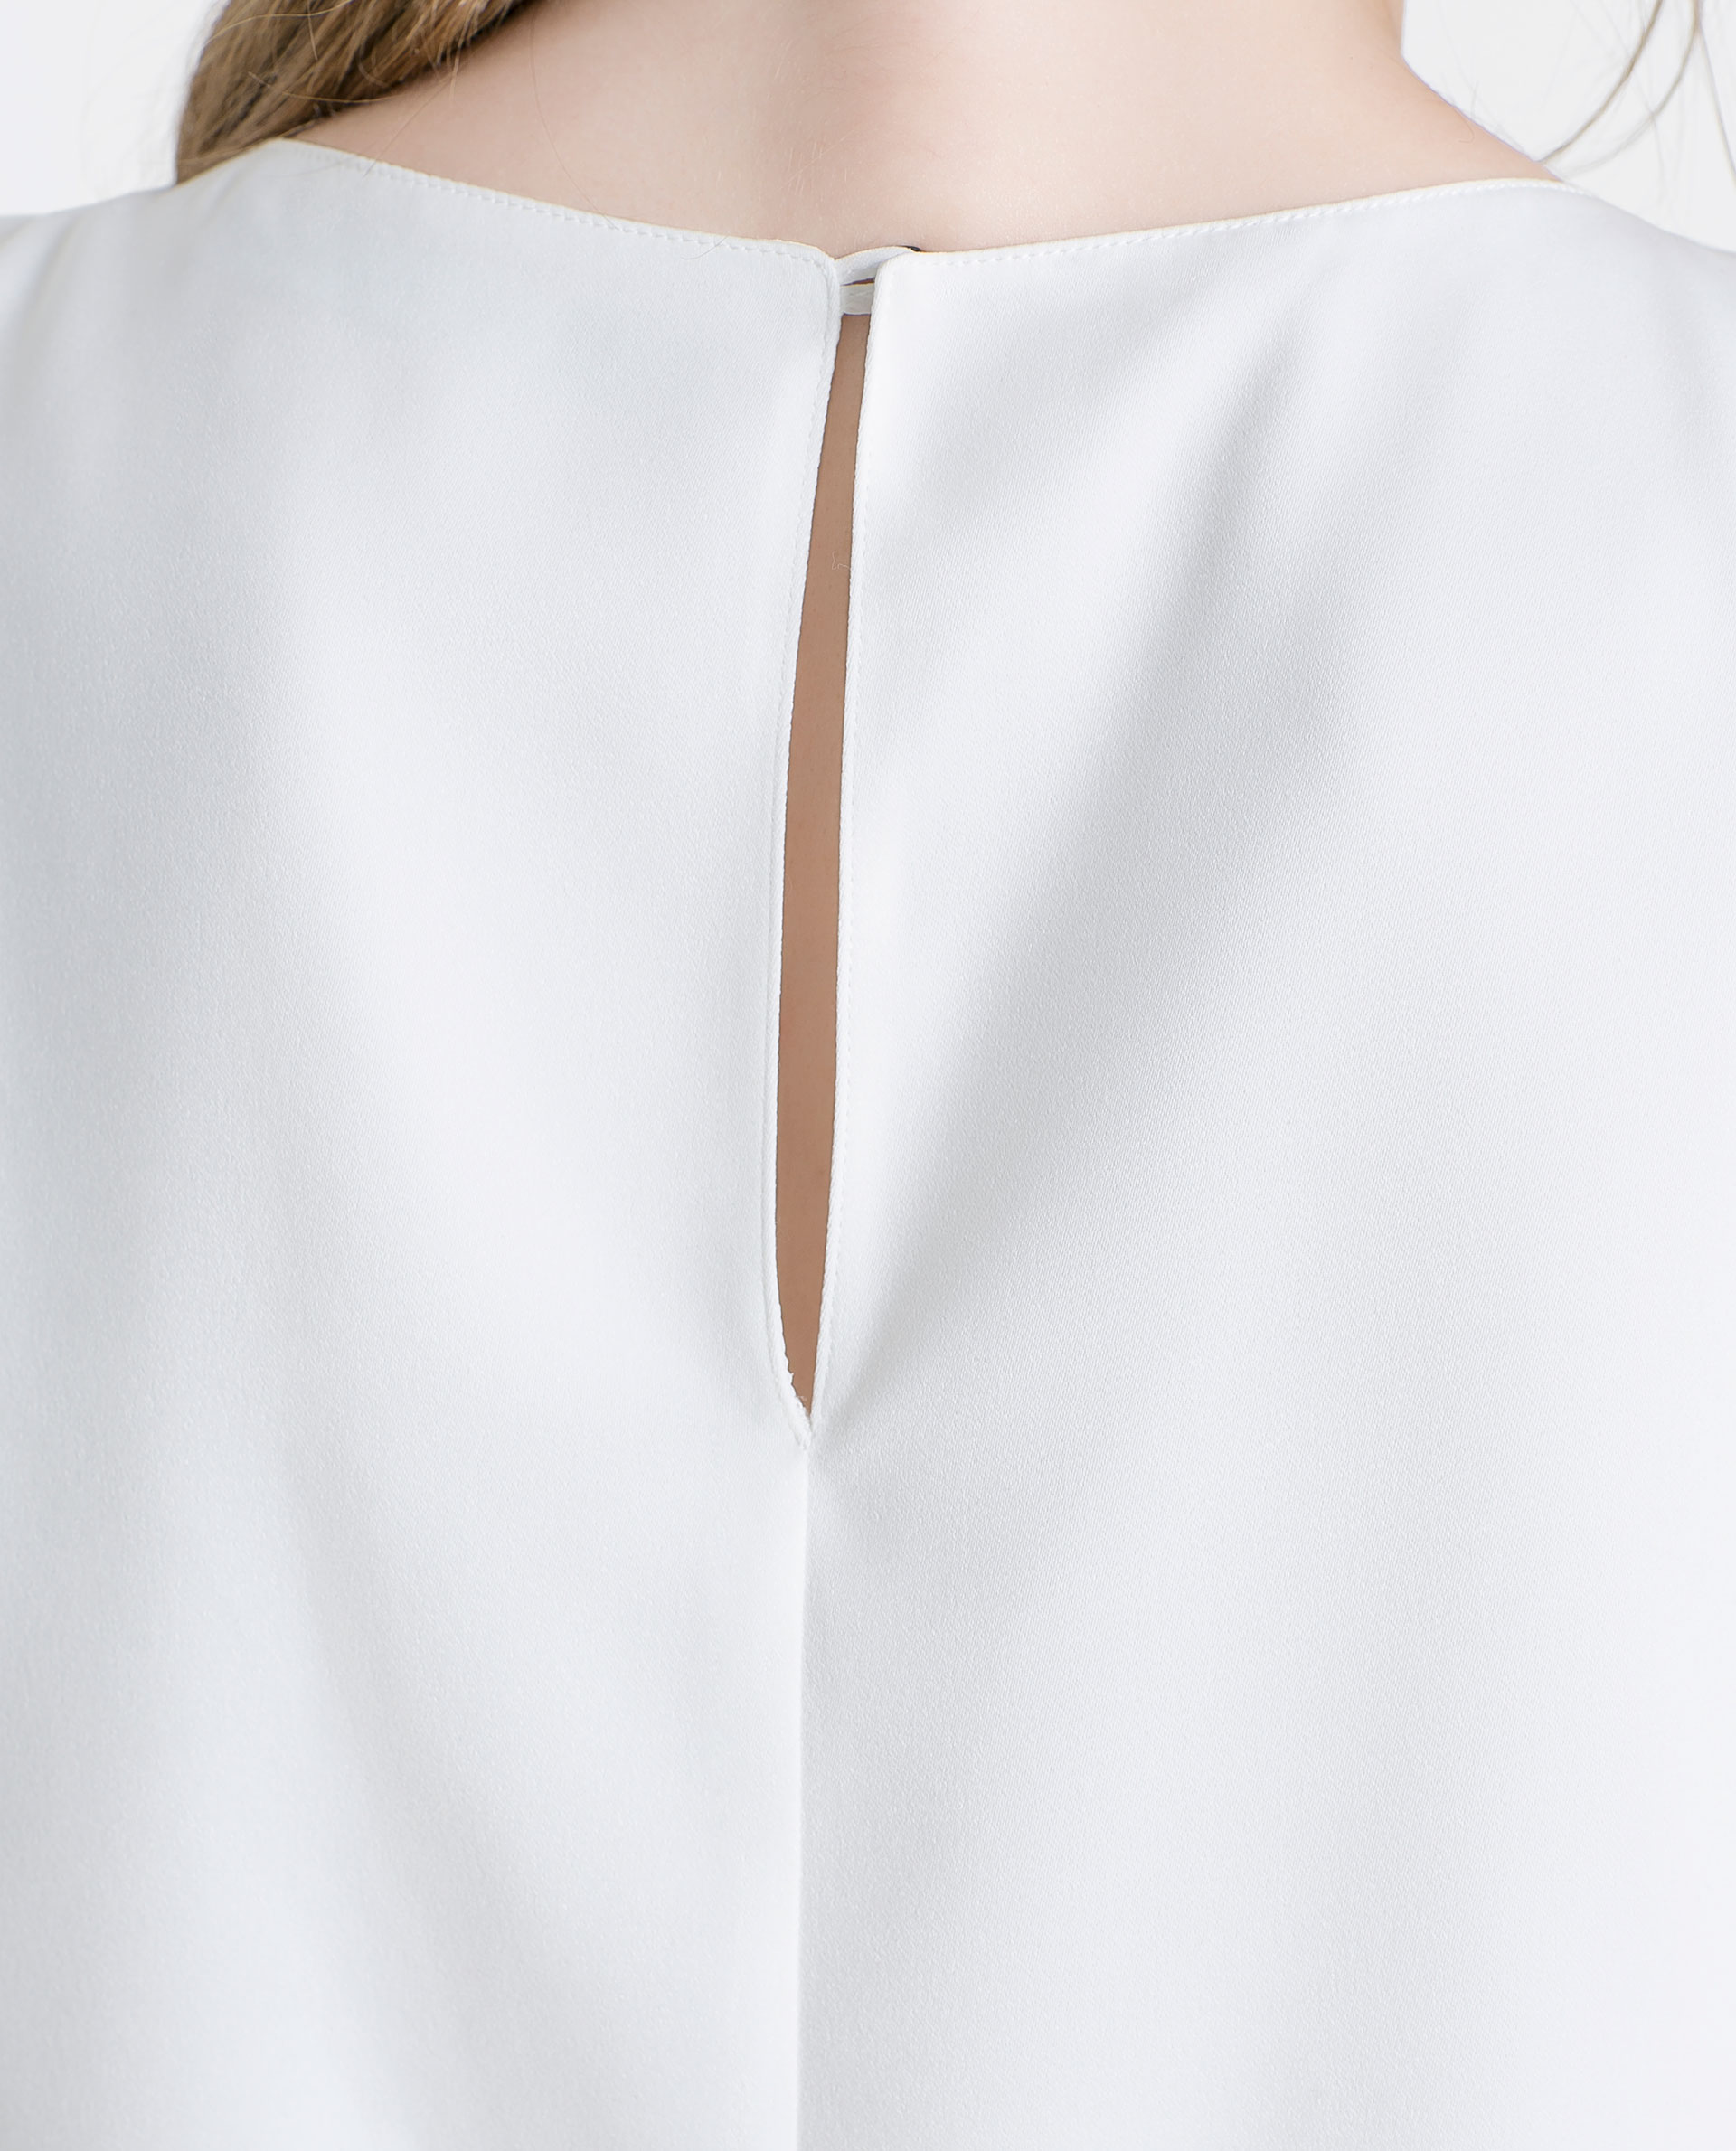 Zara Sleeveless Blouse 115